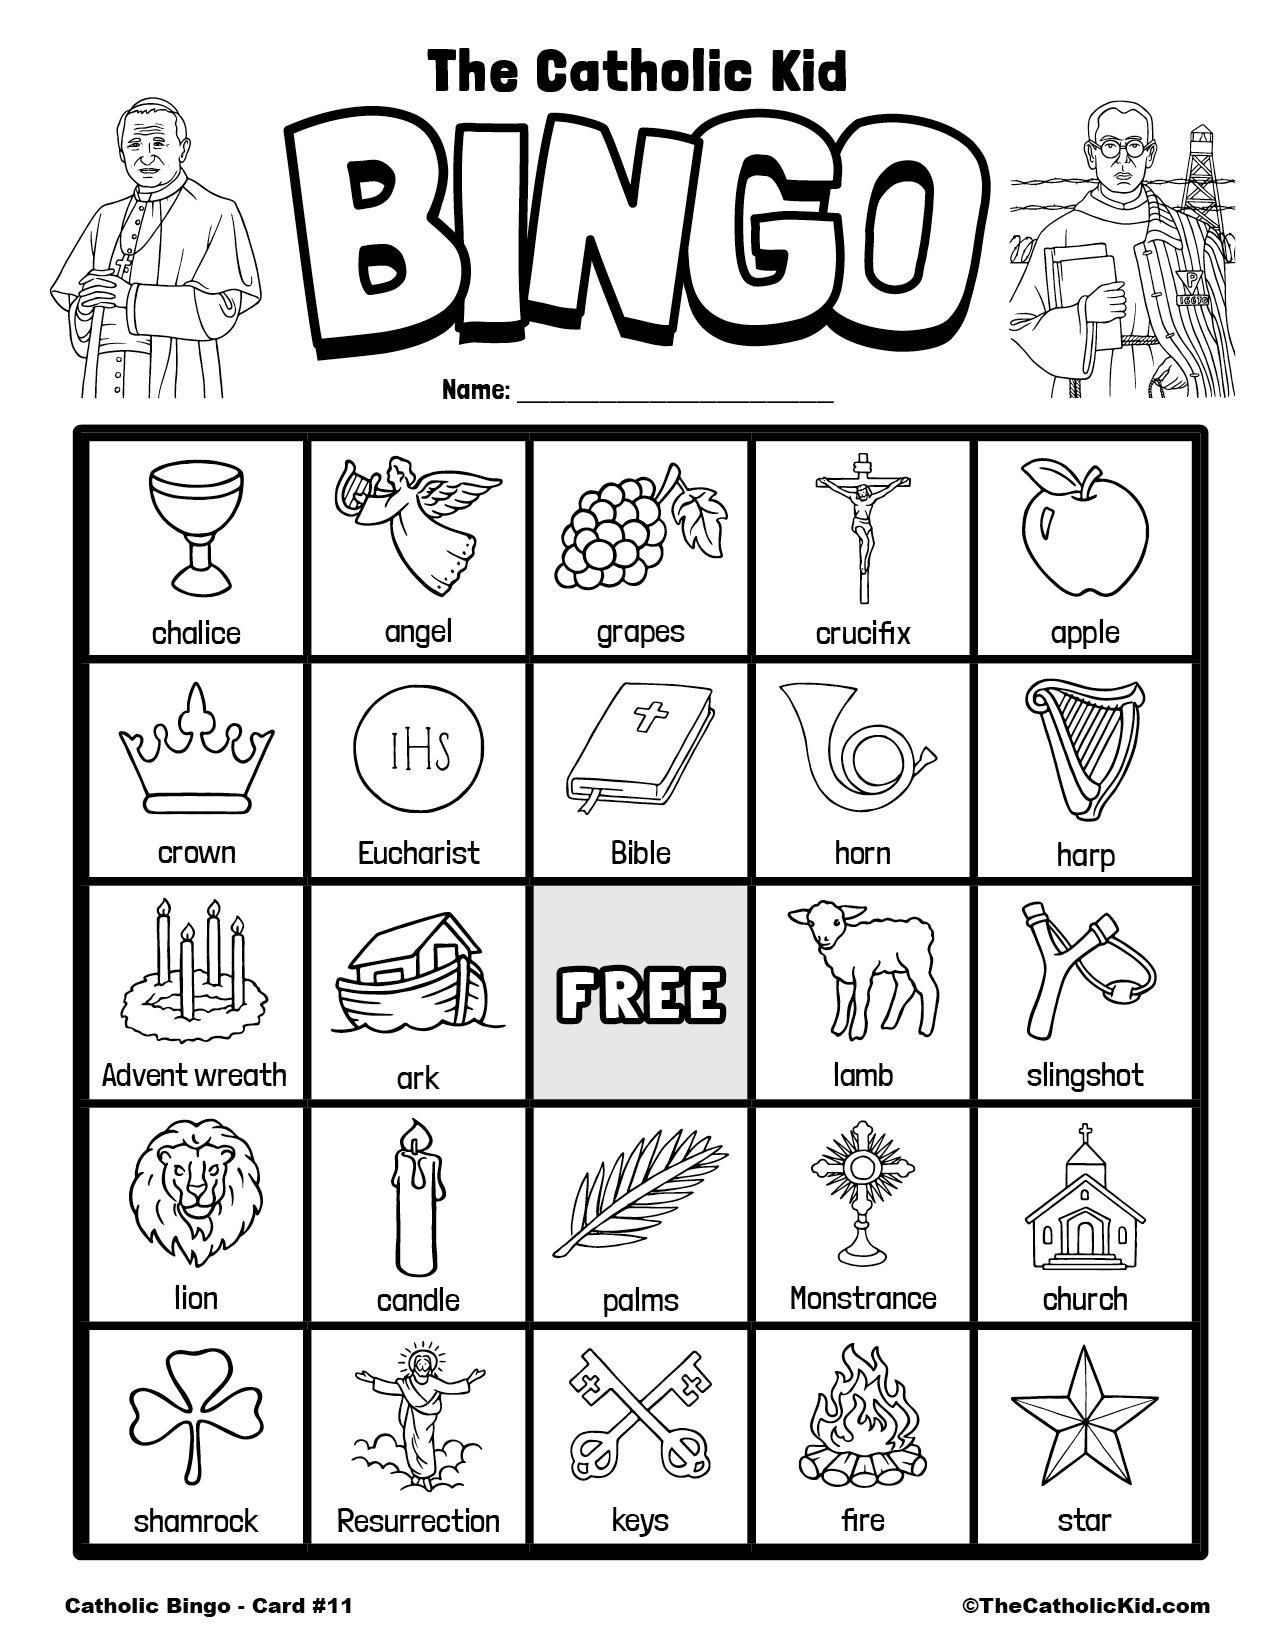 1Free Printable Catholic Bingo Game Card - 11